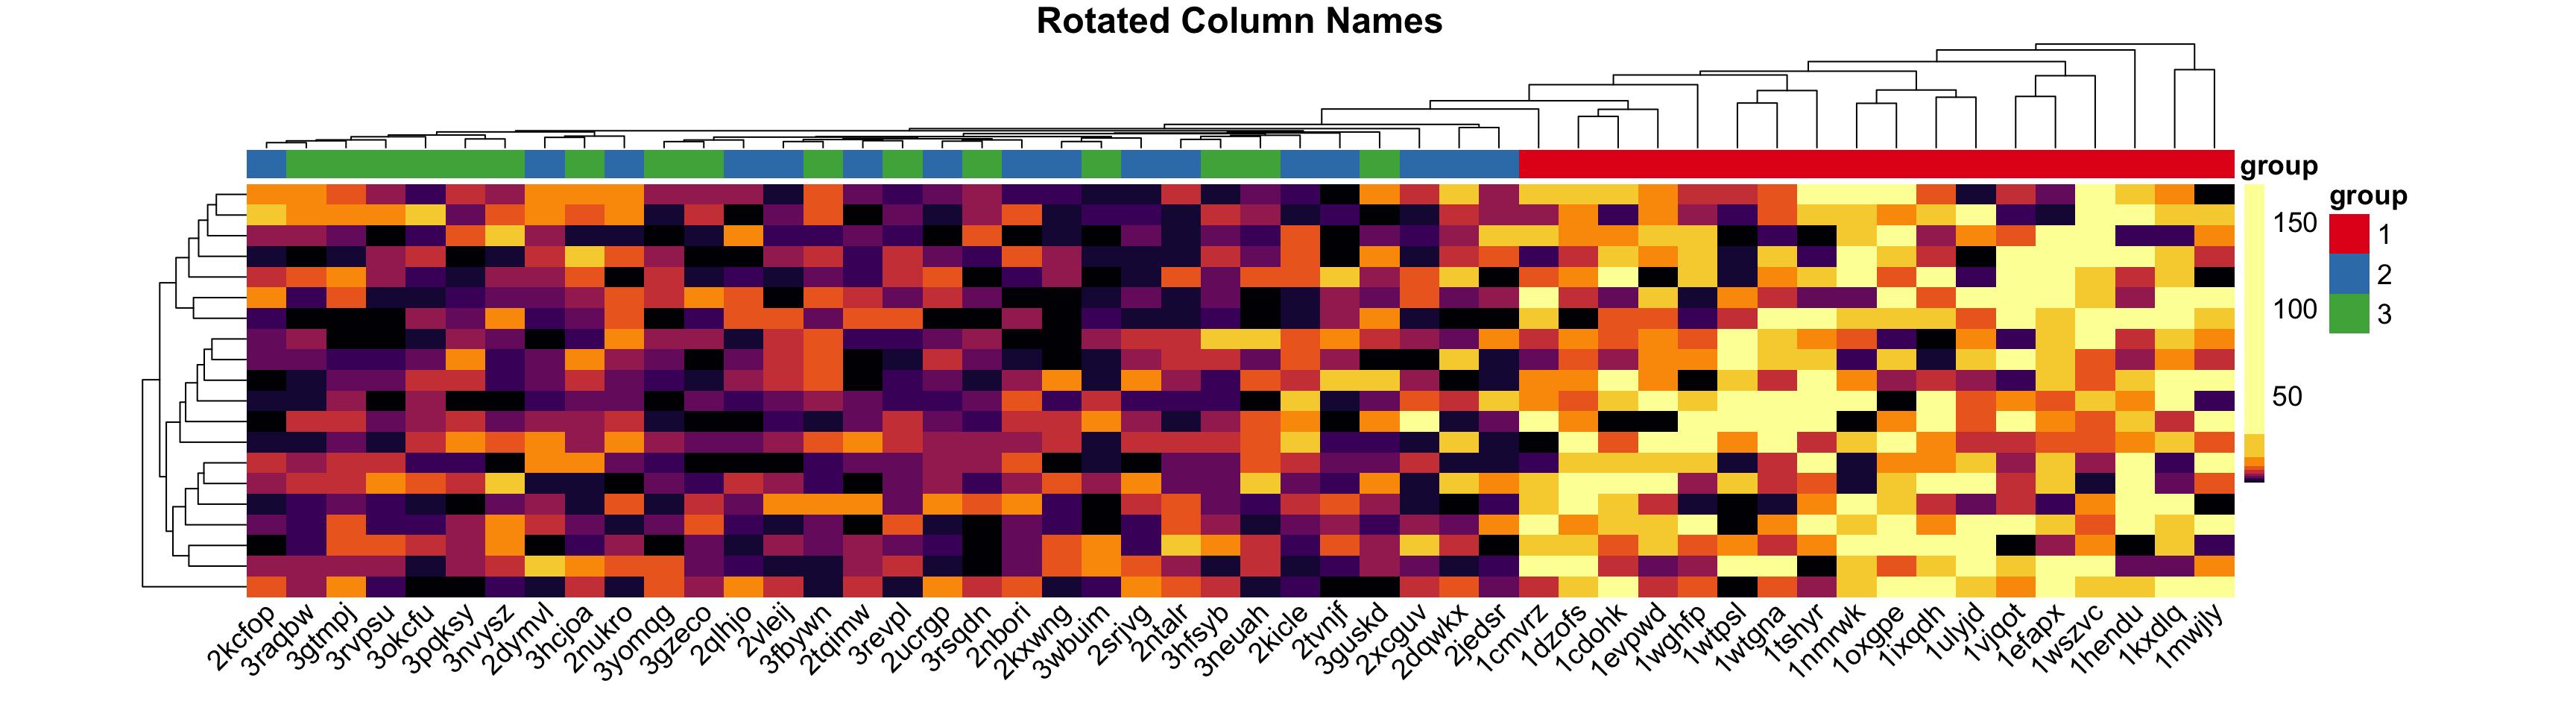 plot of chunk pheatmap-column-labels